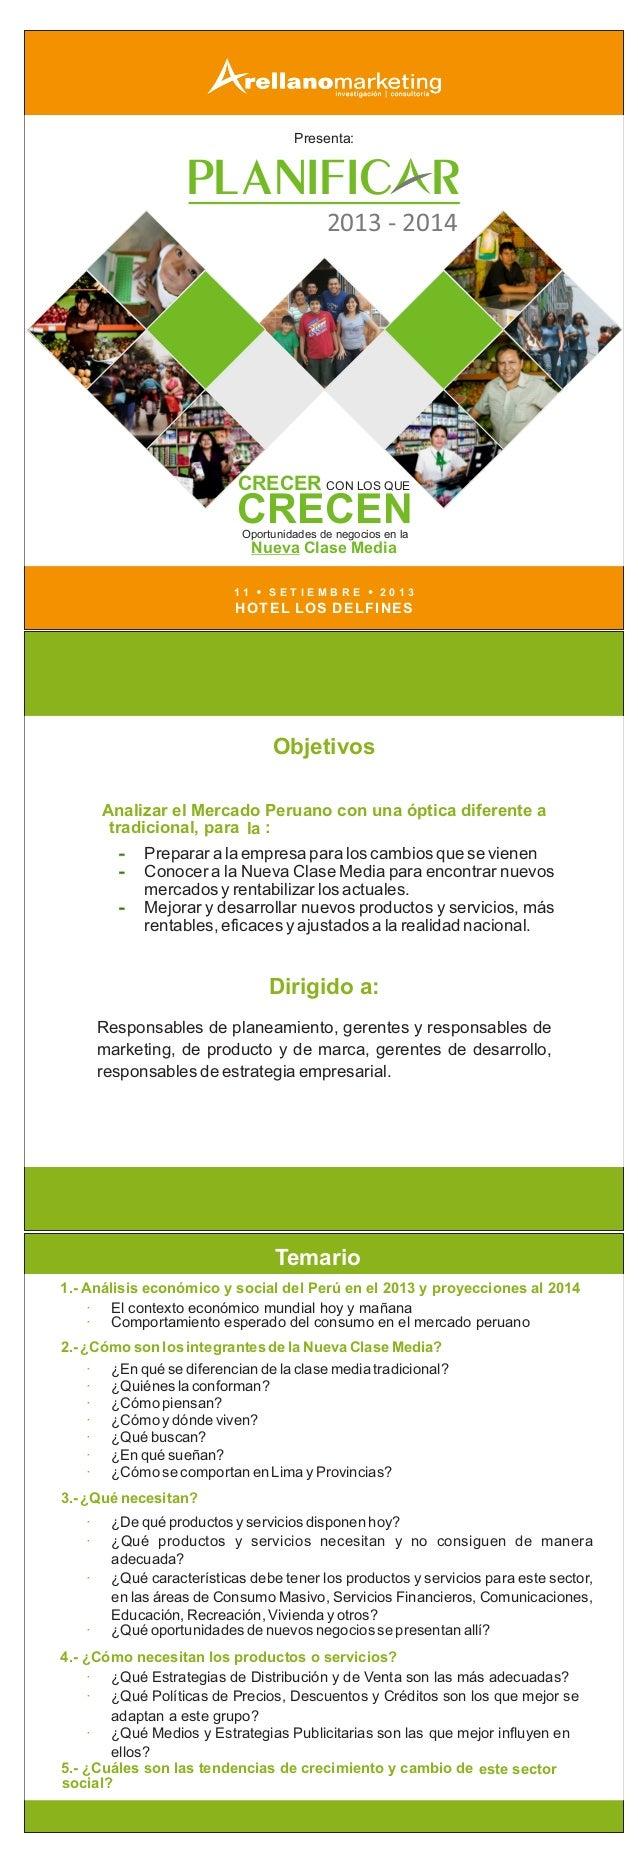 Presenta: PLANIFIC R 2013 - 2014 1 1 S E T I E M B R E 2 0 1 3 HOTEL LOS DELFINES CON LOS QUECON LOS QUECON LOS QUE CRECEN...